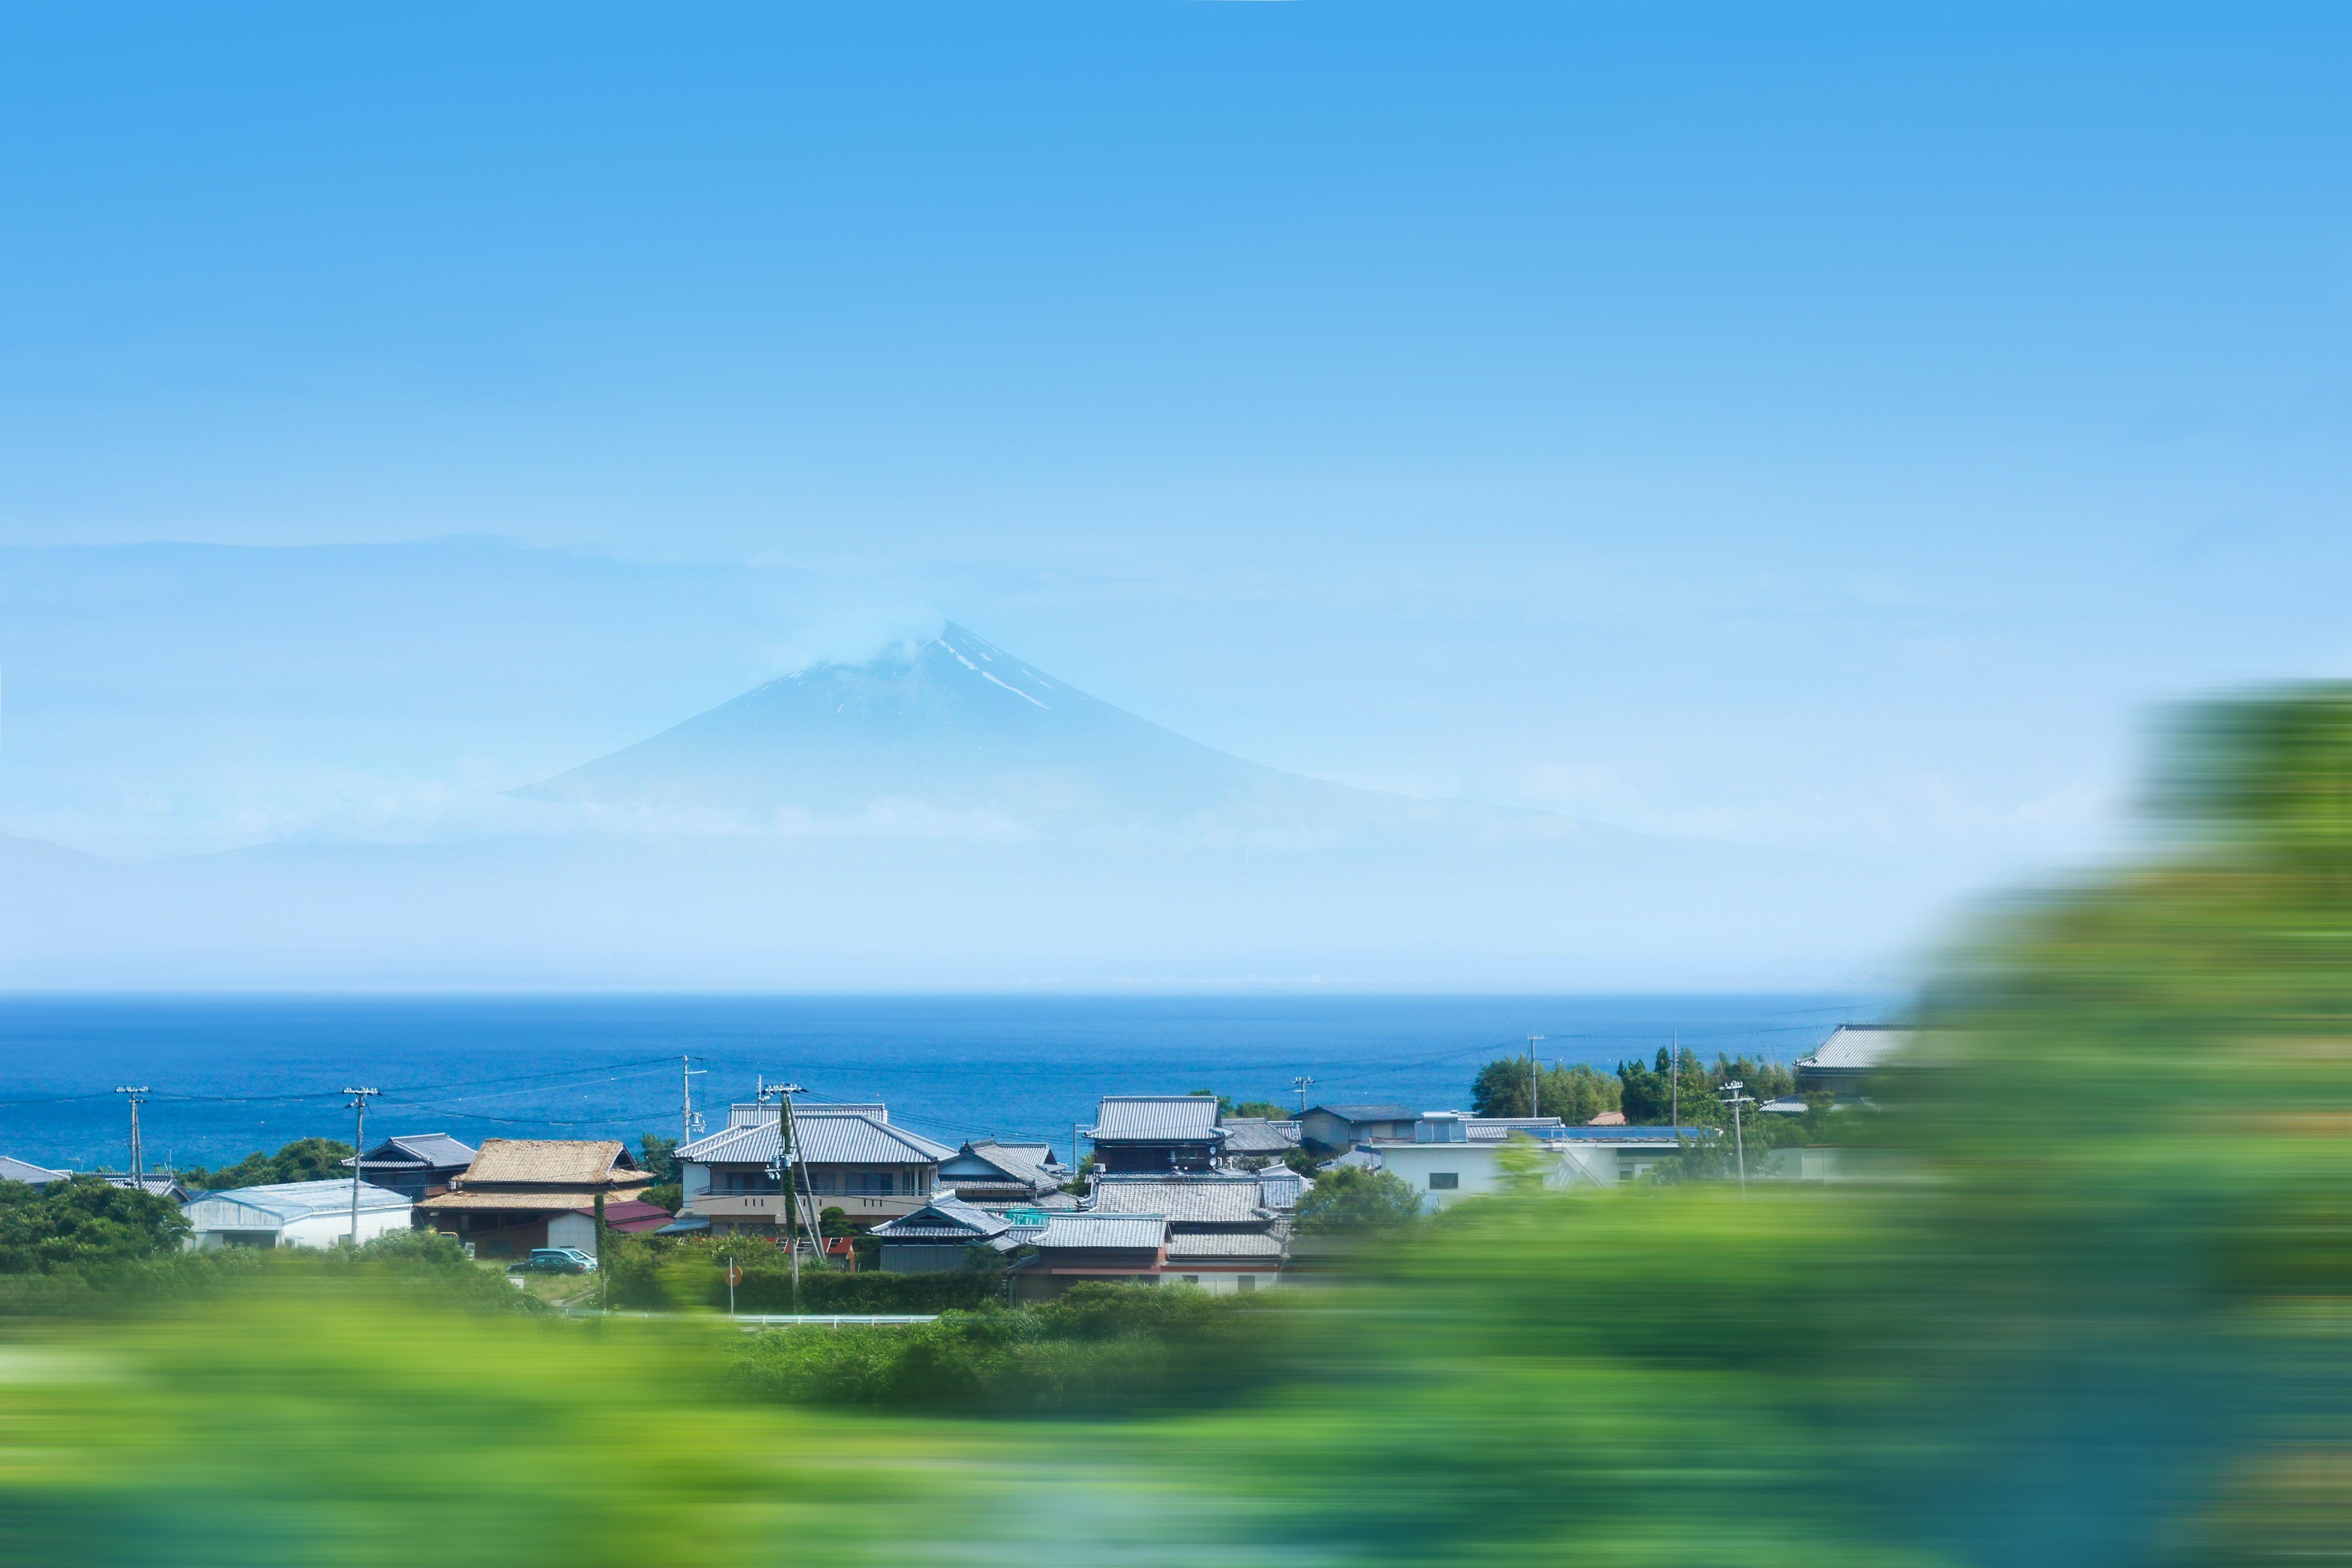 timelapse photo of house near ocean across Mt. Fuji